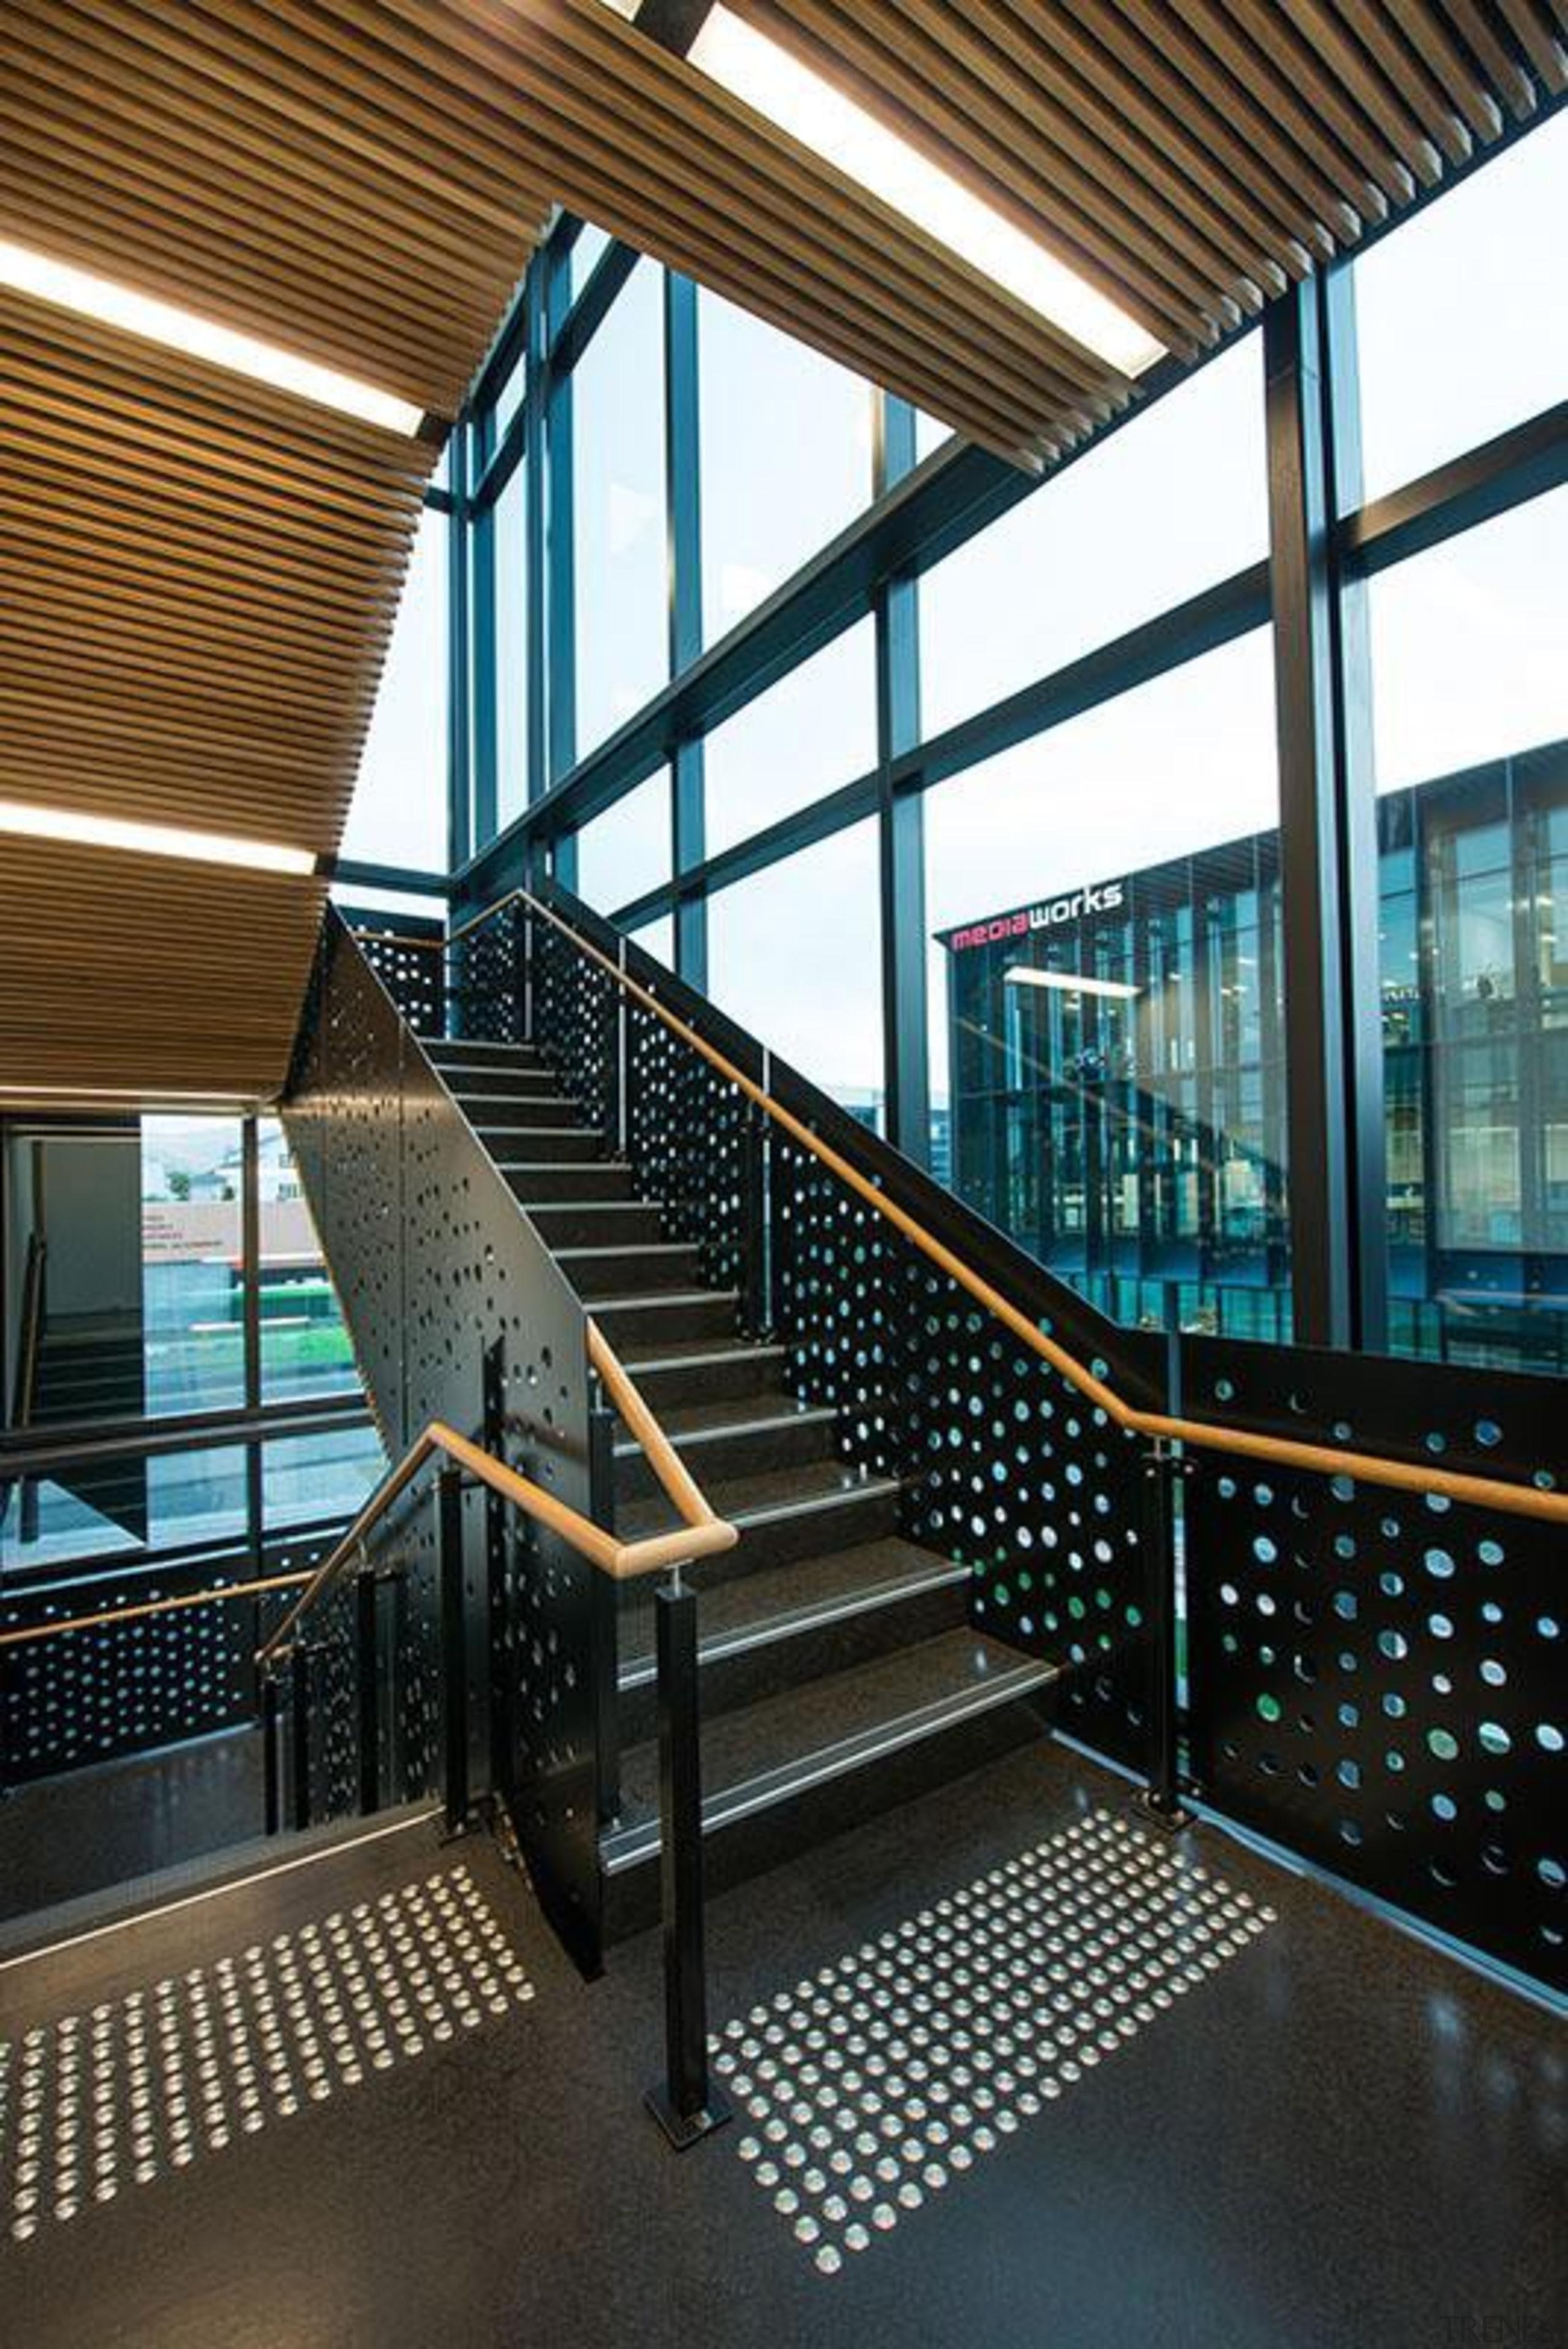 MERIT WINNERThree35 (4 of 4) - Hays Commercial architecture, building, condominium, daylighting, glass, handrail, metropolitan area, stairs, structure, window, black